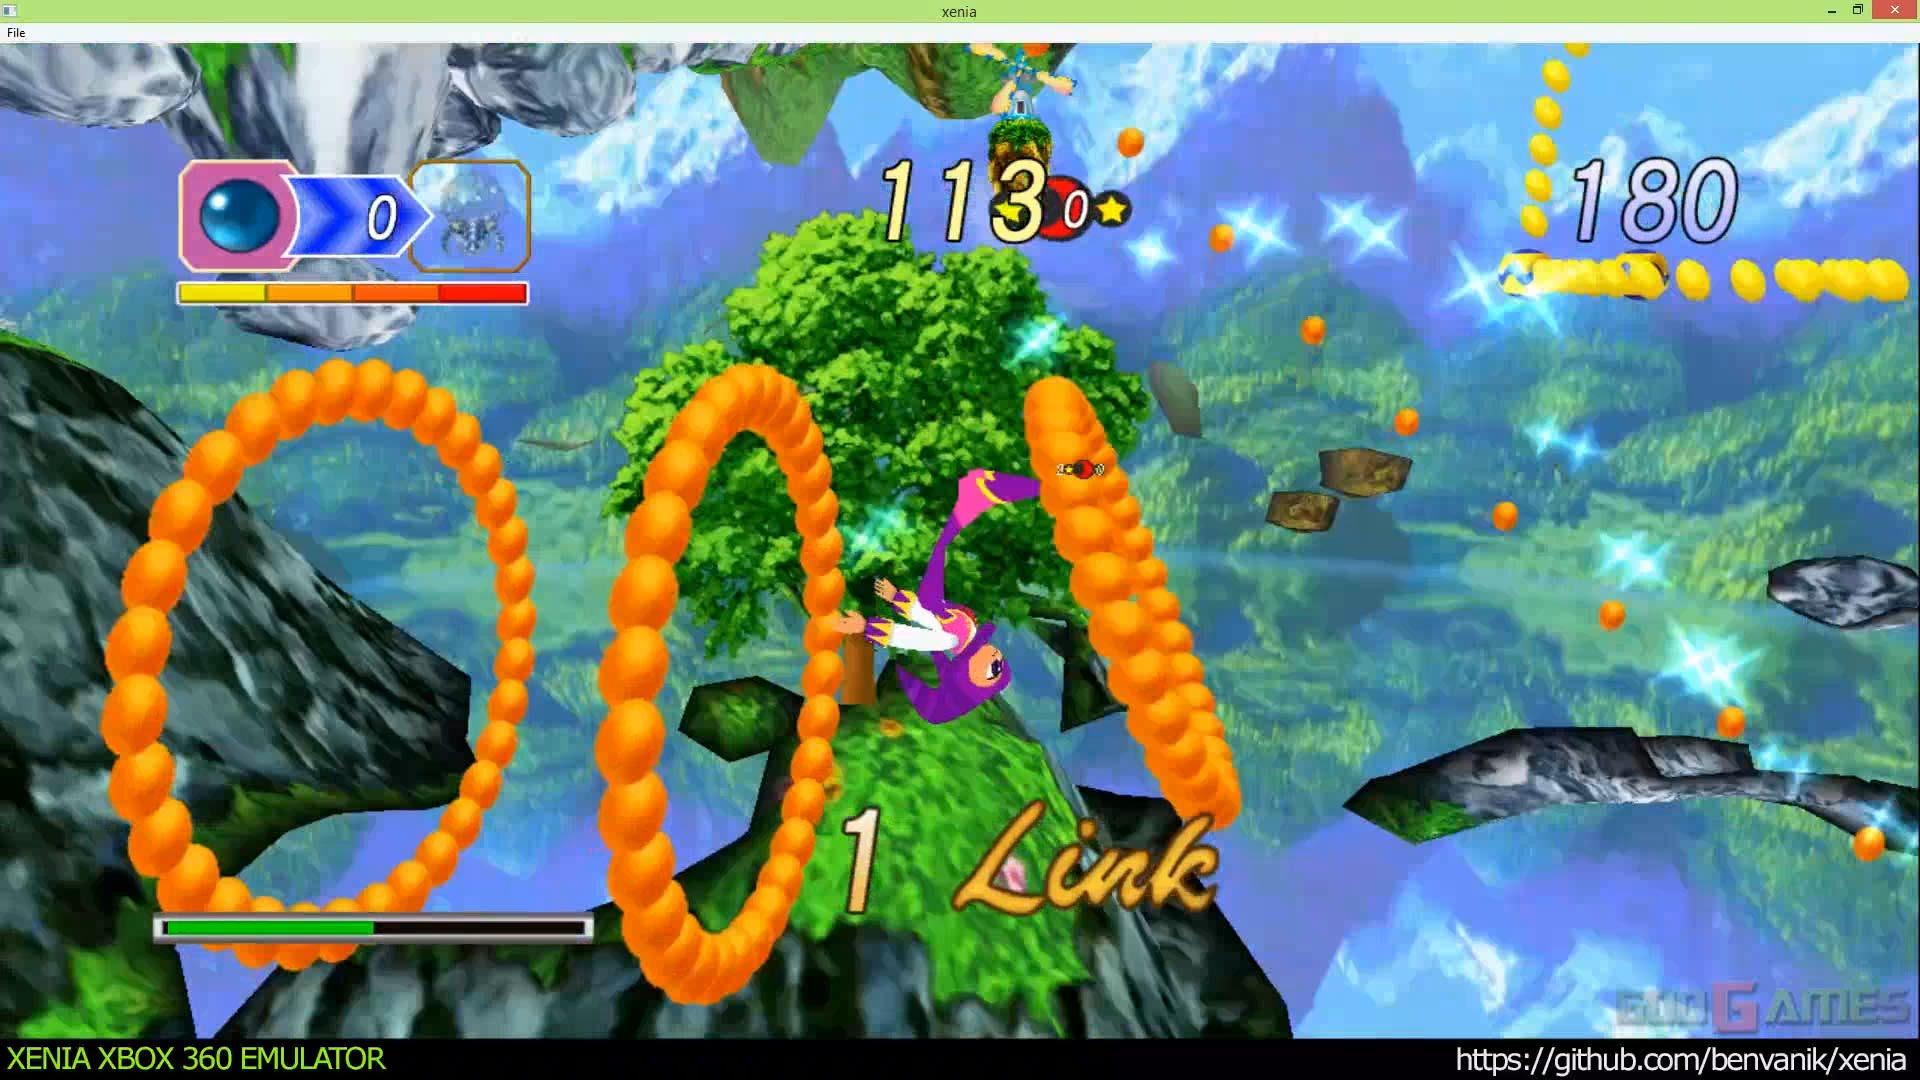 Emulation Microsoft Xbox 360 - Liste des Emulateurs Microsoft Xbox